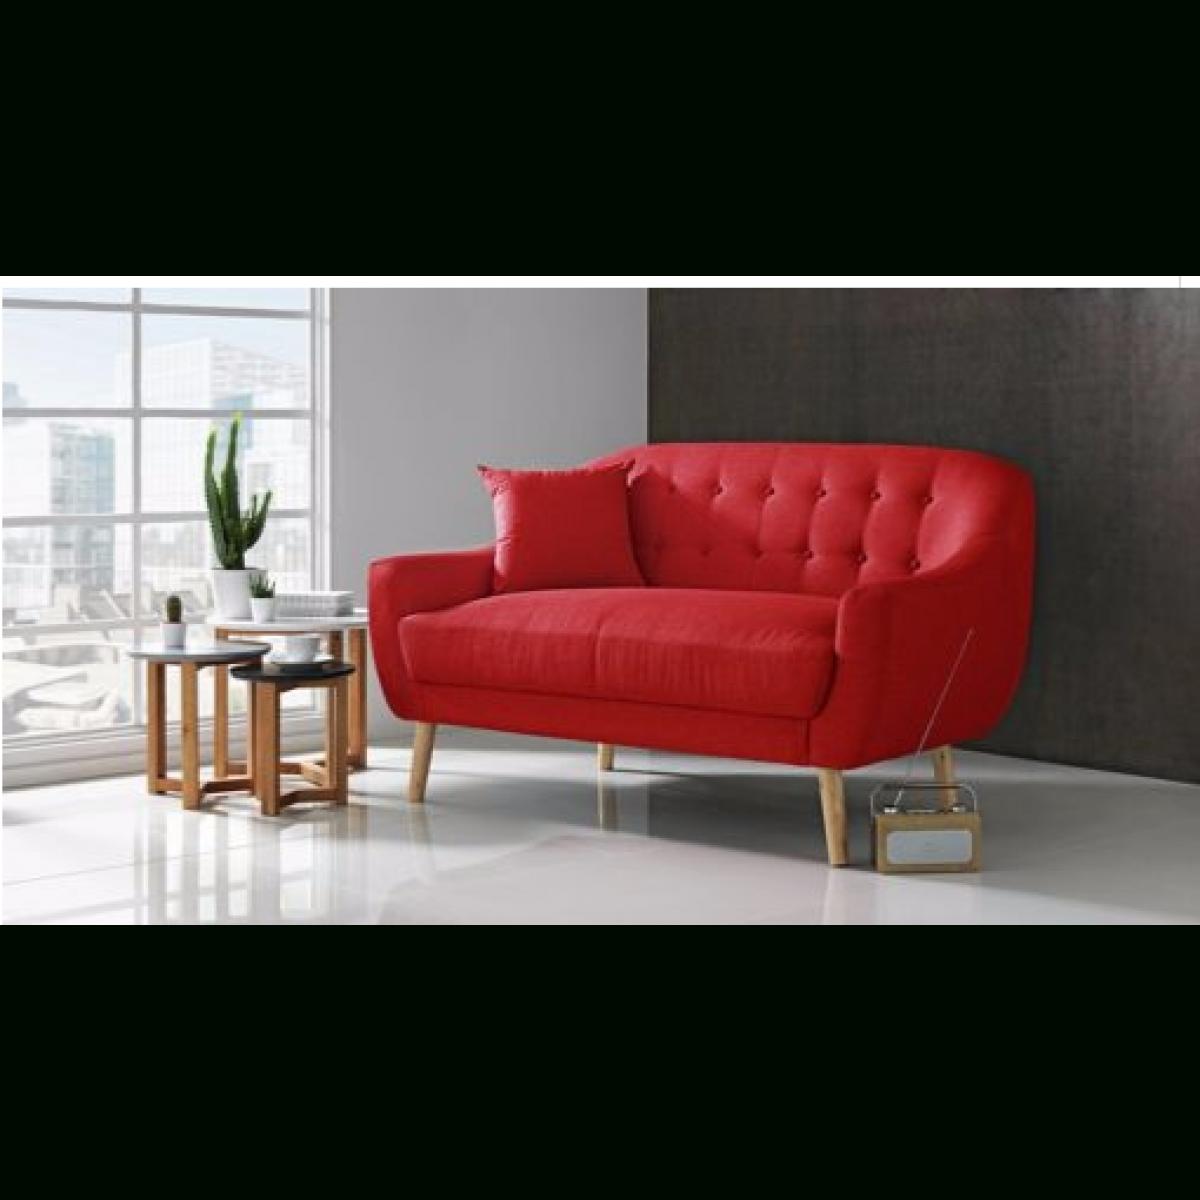 Hygena Lexie Retro Fabric Sofa 3 Seater Lemon Yellow. – Furnico For Retro Sofas And Chairs (Photo 5 of 20)